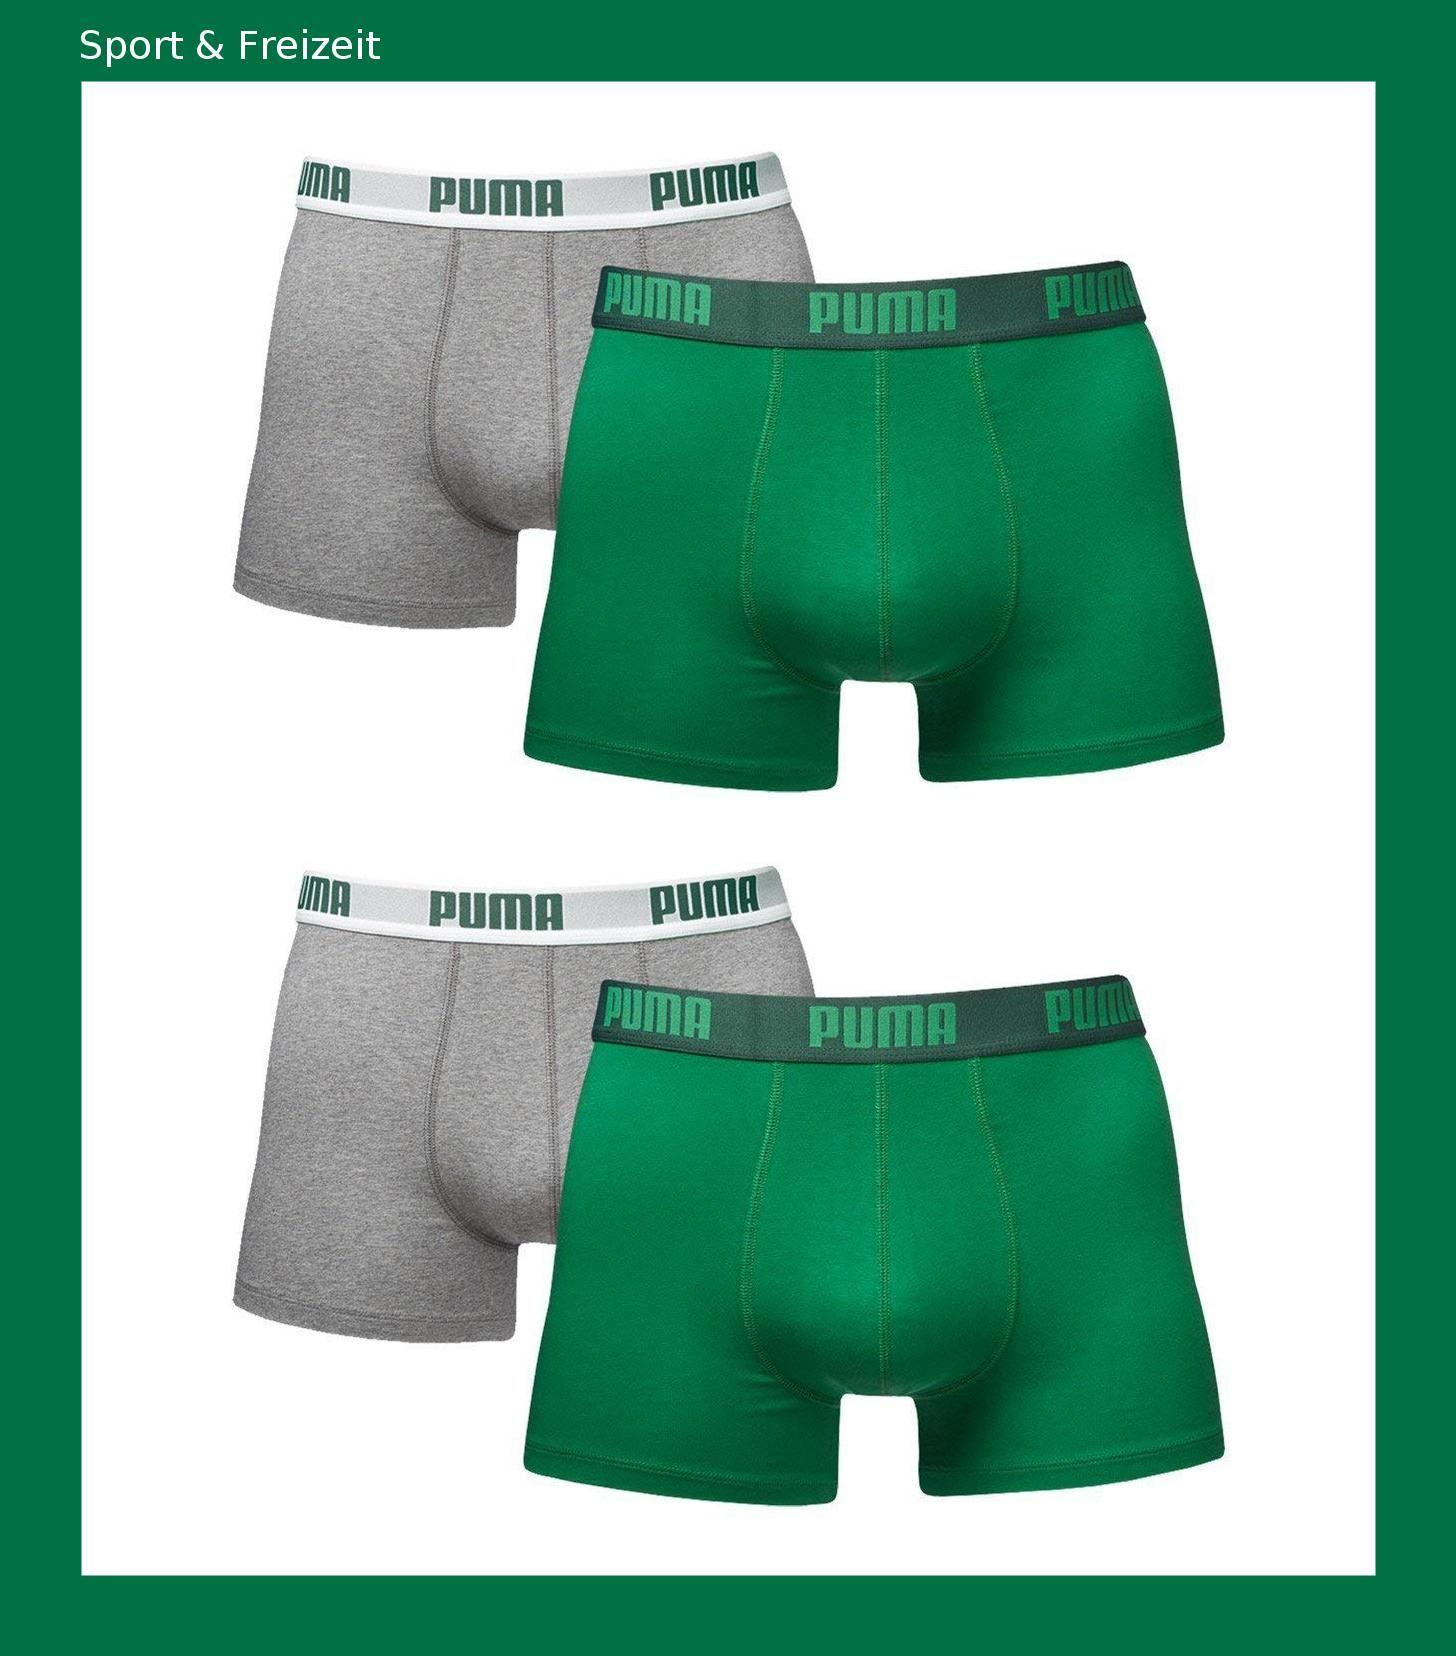 2959ce5e63 Puma Herren Boxer Basic Unterhosen 4er Pack in verschiedenen Farben  521015001